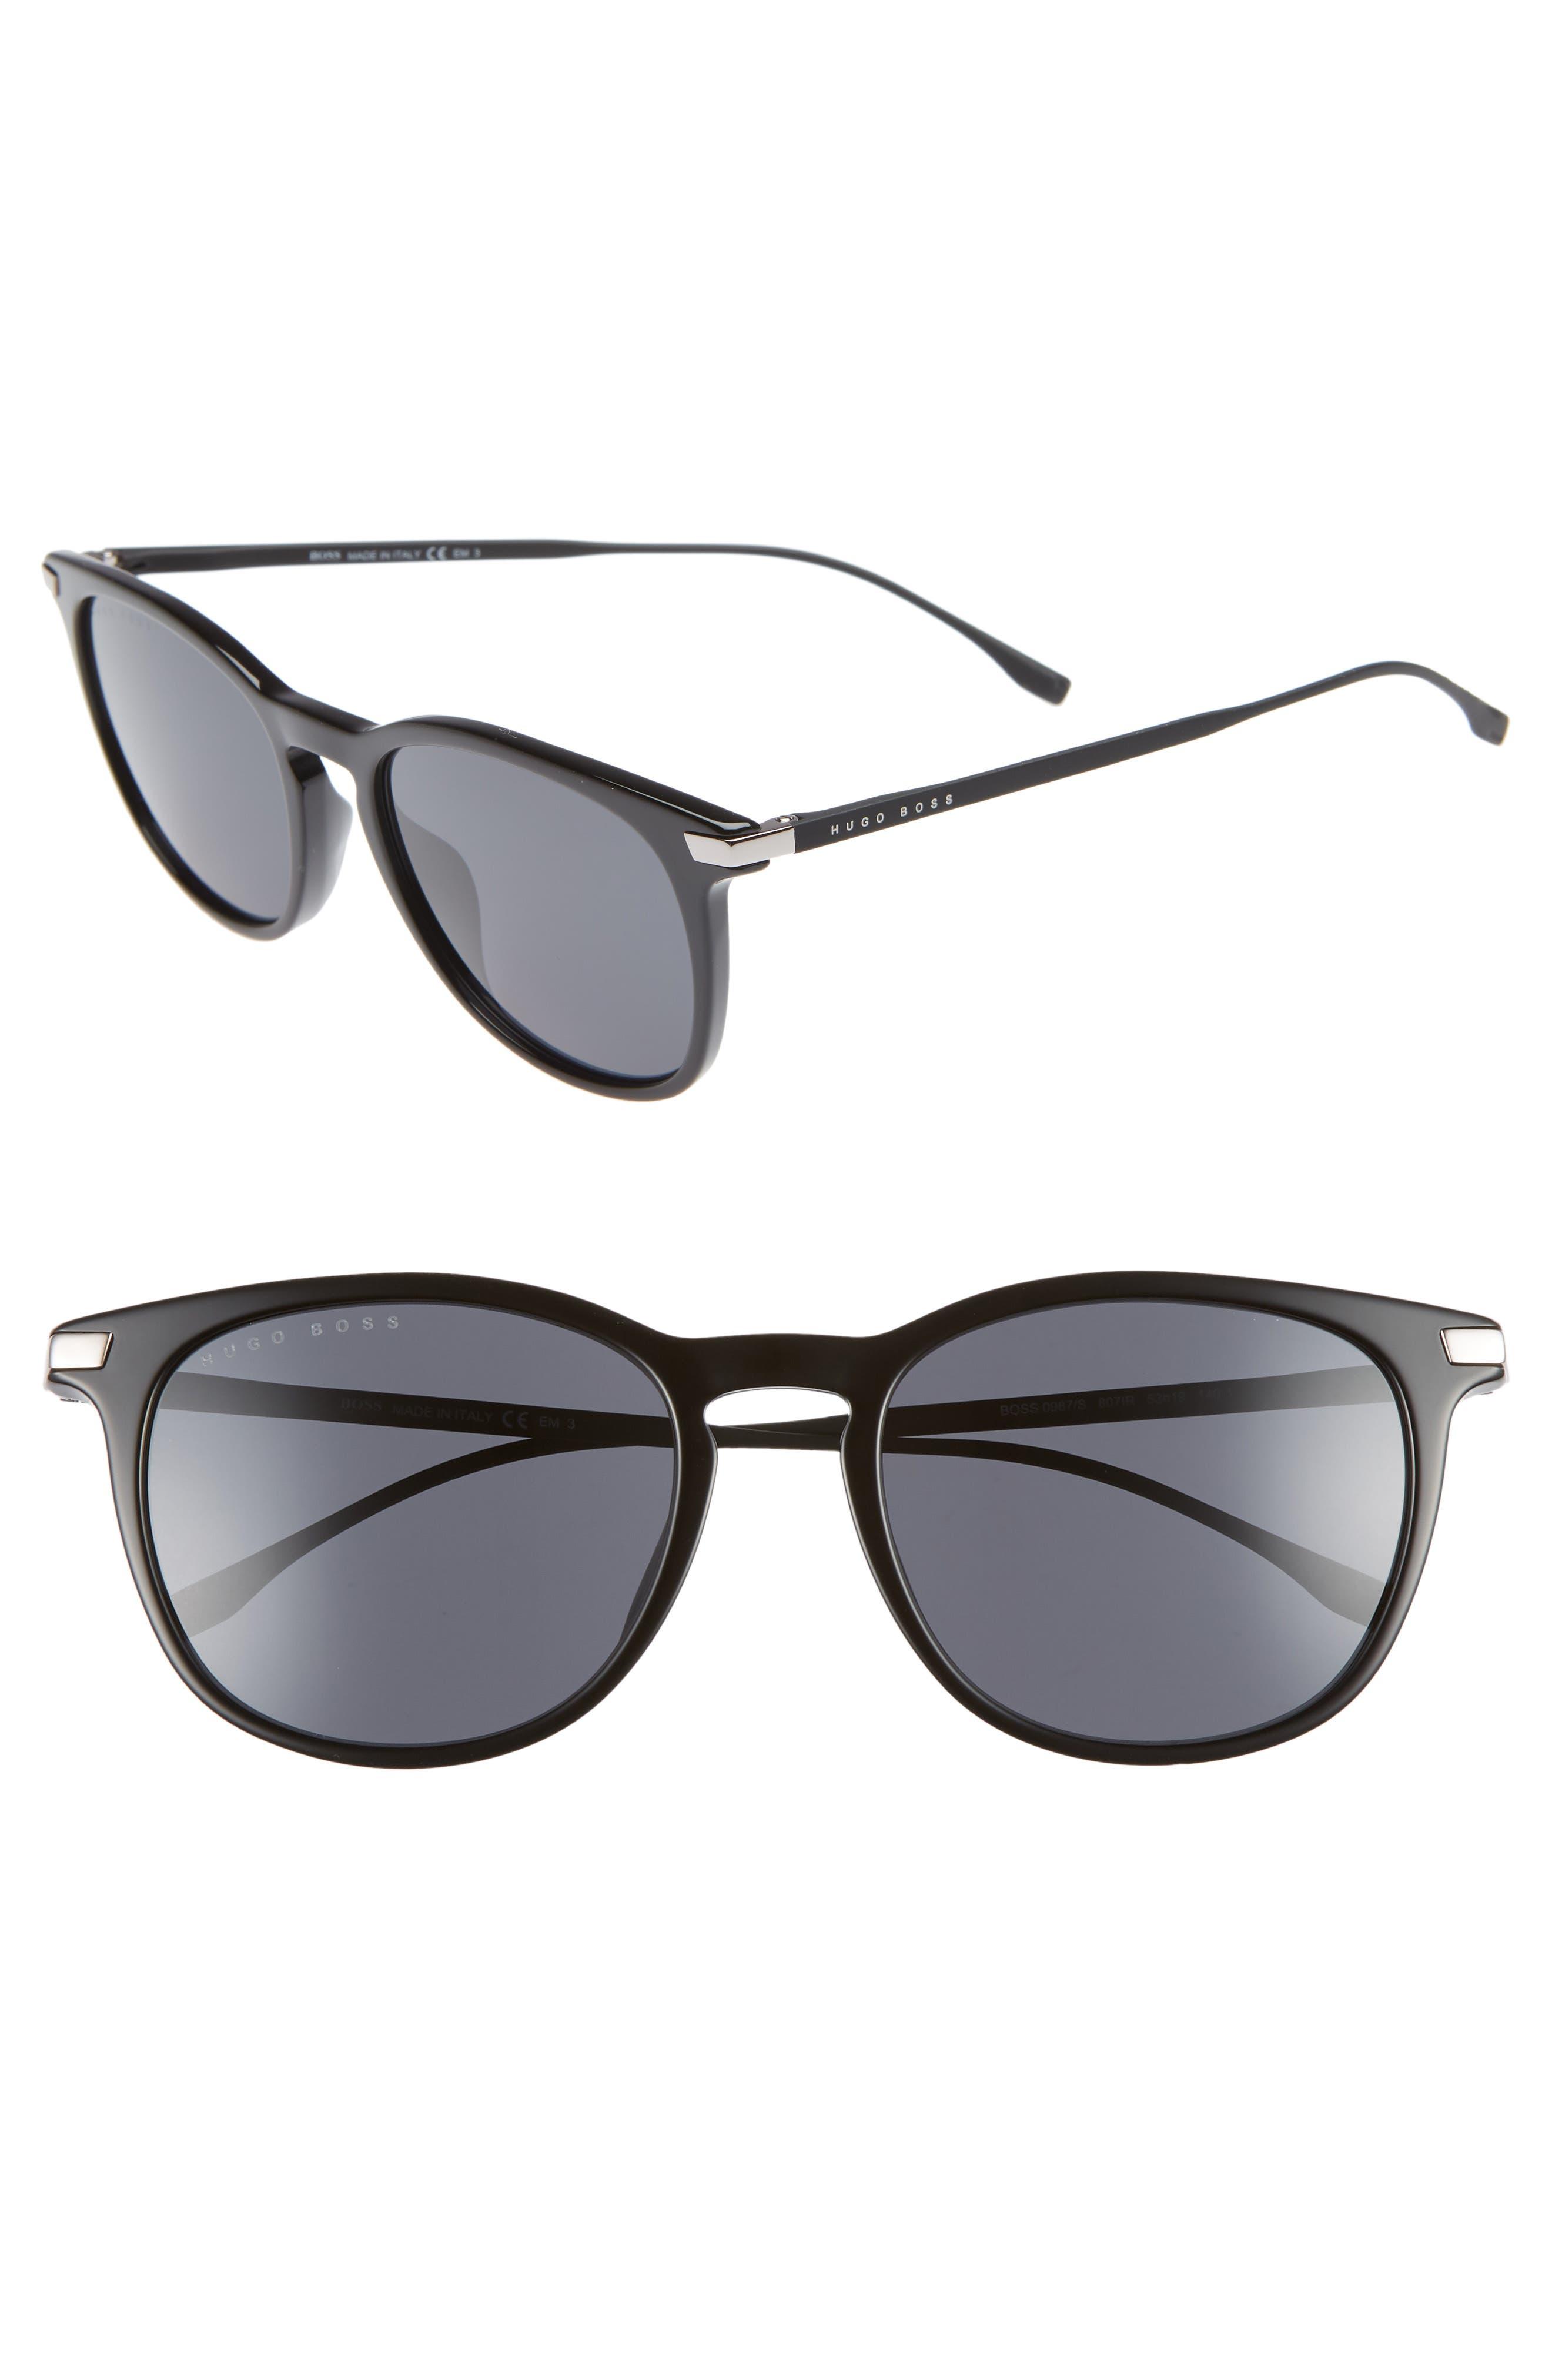 53mm Sunglasses,                         Main,                         color, BLACK